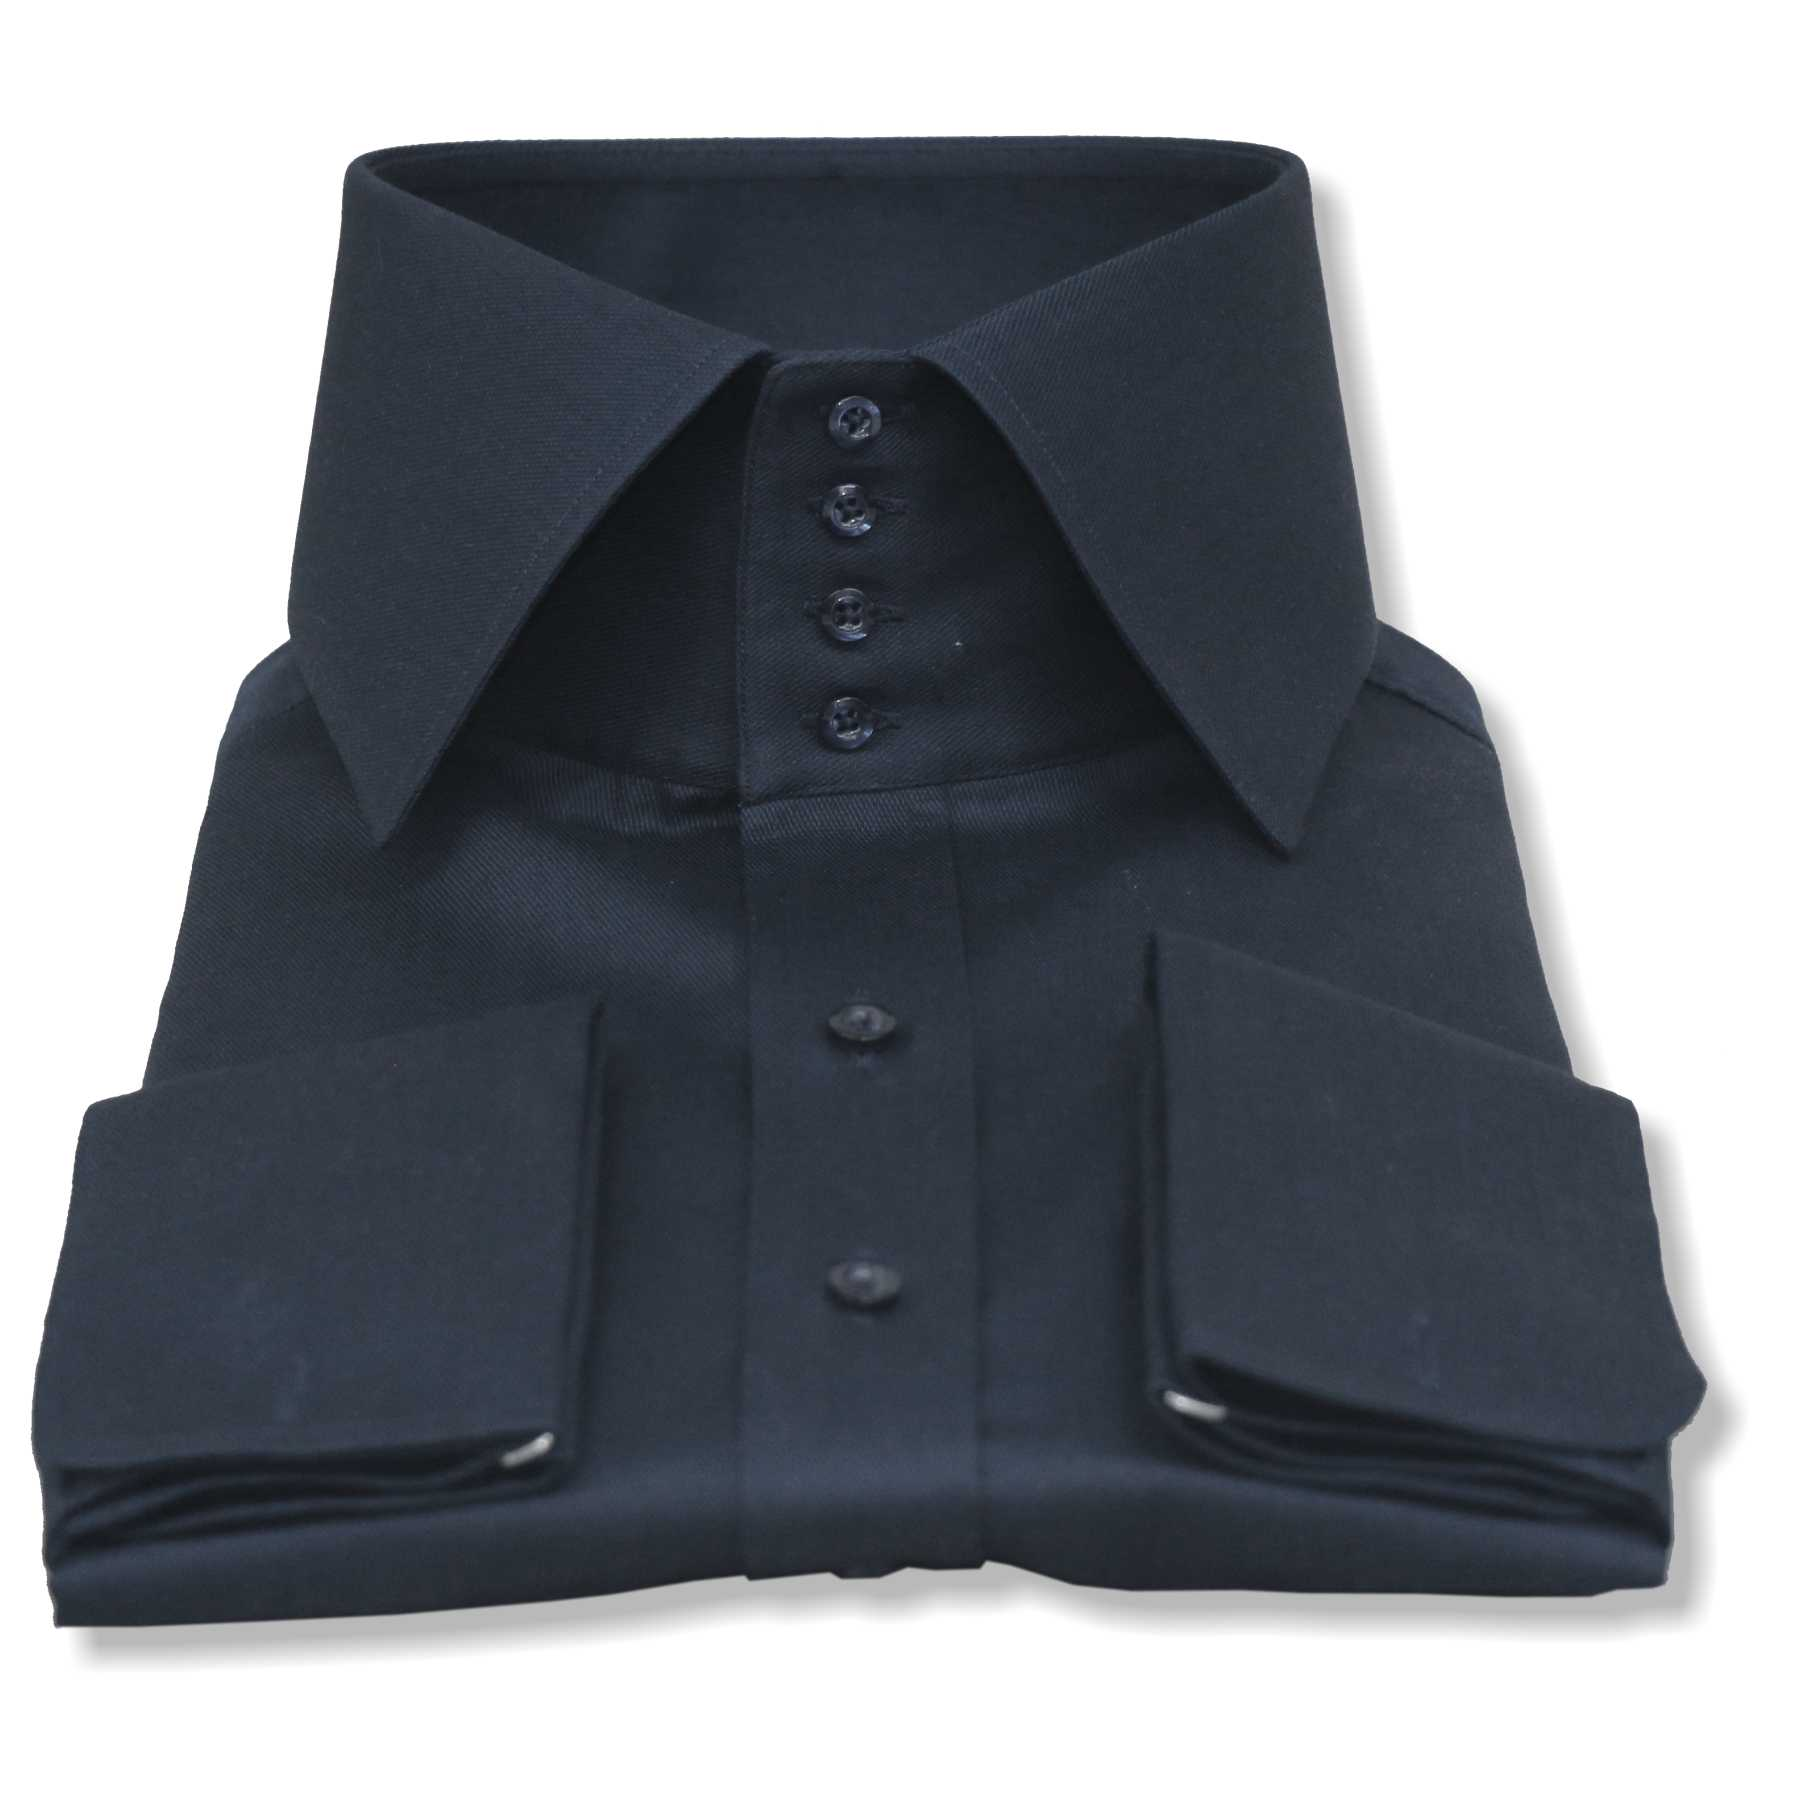 "High collar shirt 3/"" band 4 buttons Blue Gingham Checks 100/% Cotton shirts Gents"